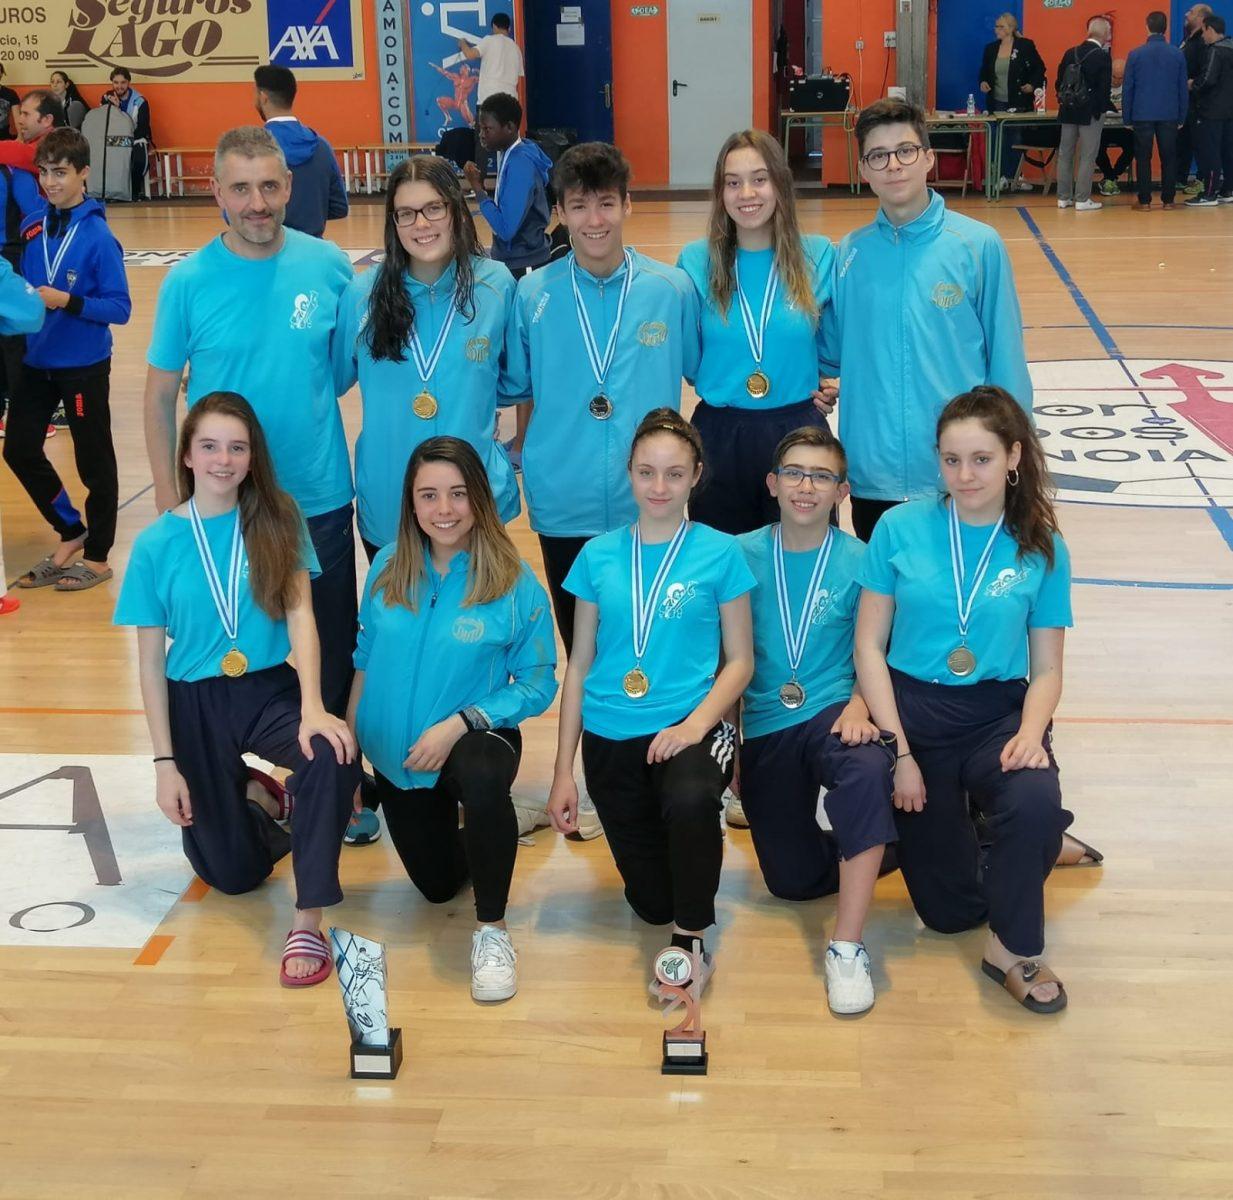 Cto. Galego Junior Taekwondo Couto 2019 - III (2)